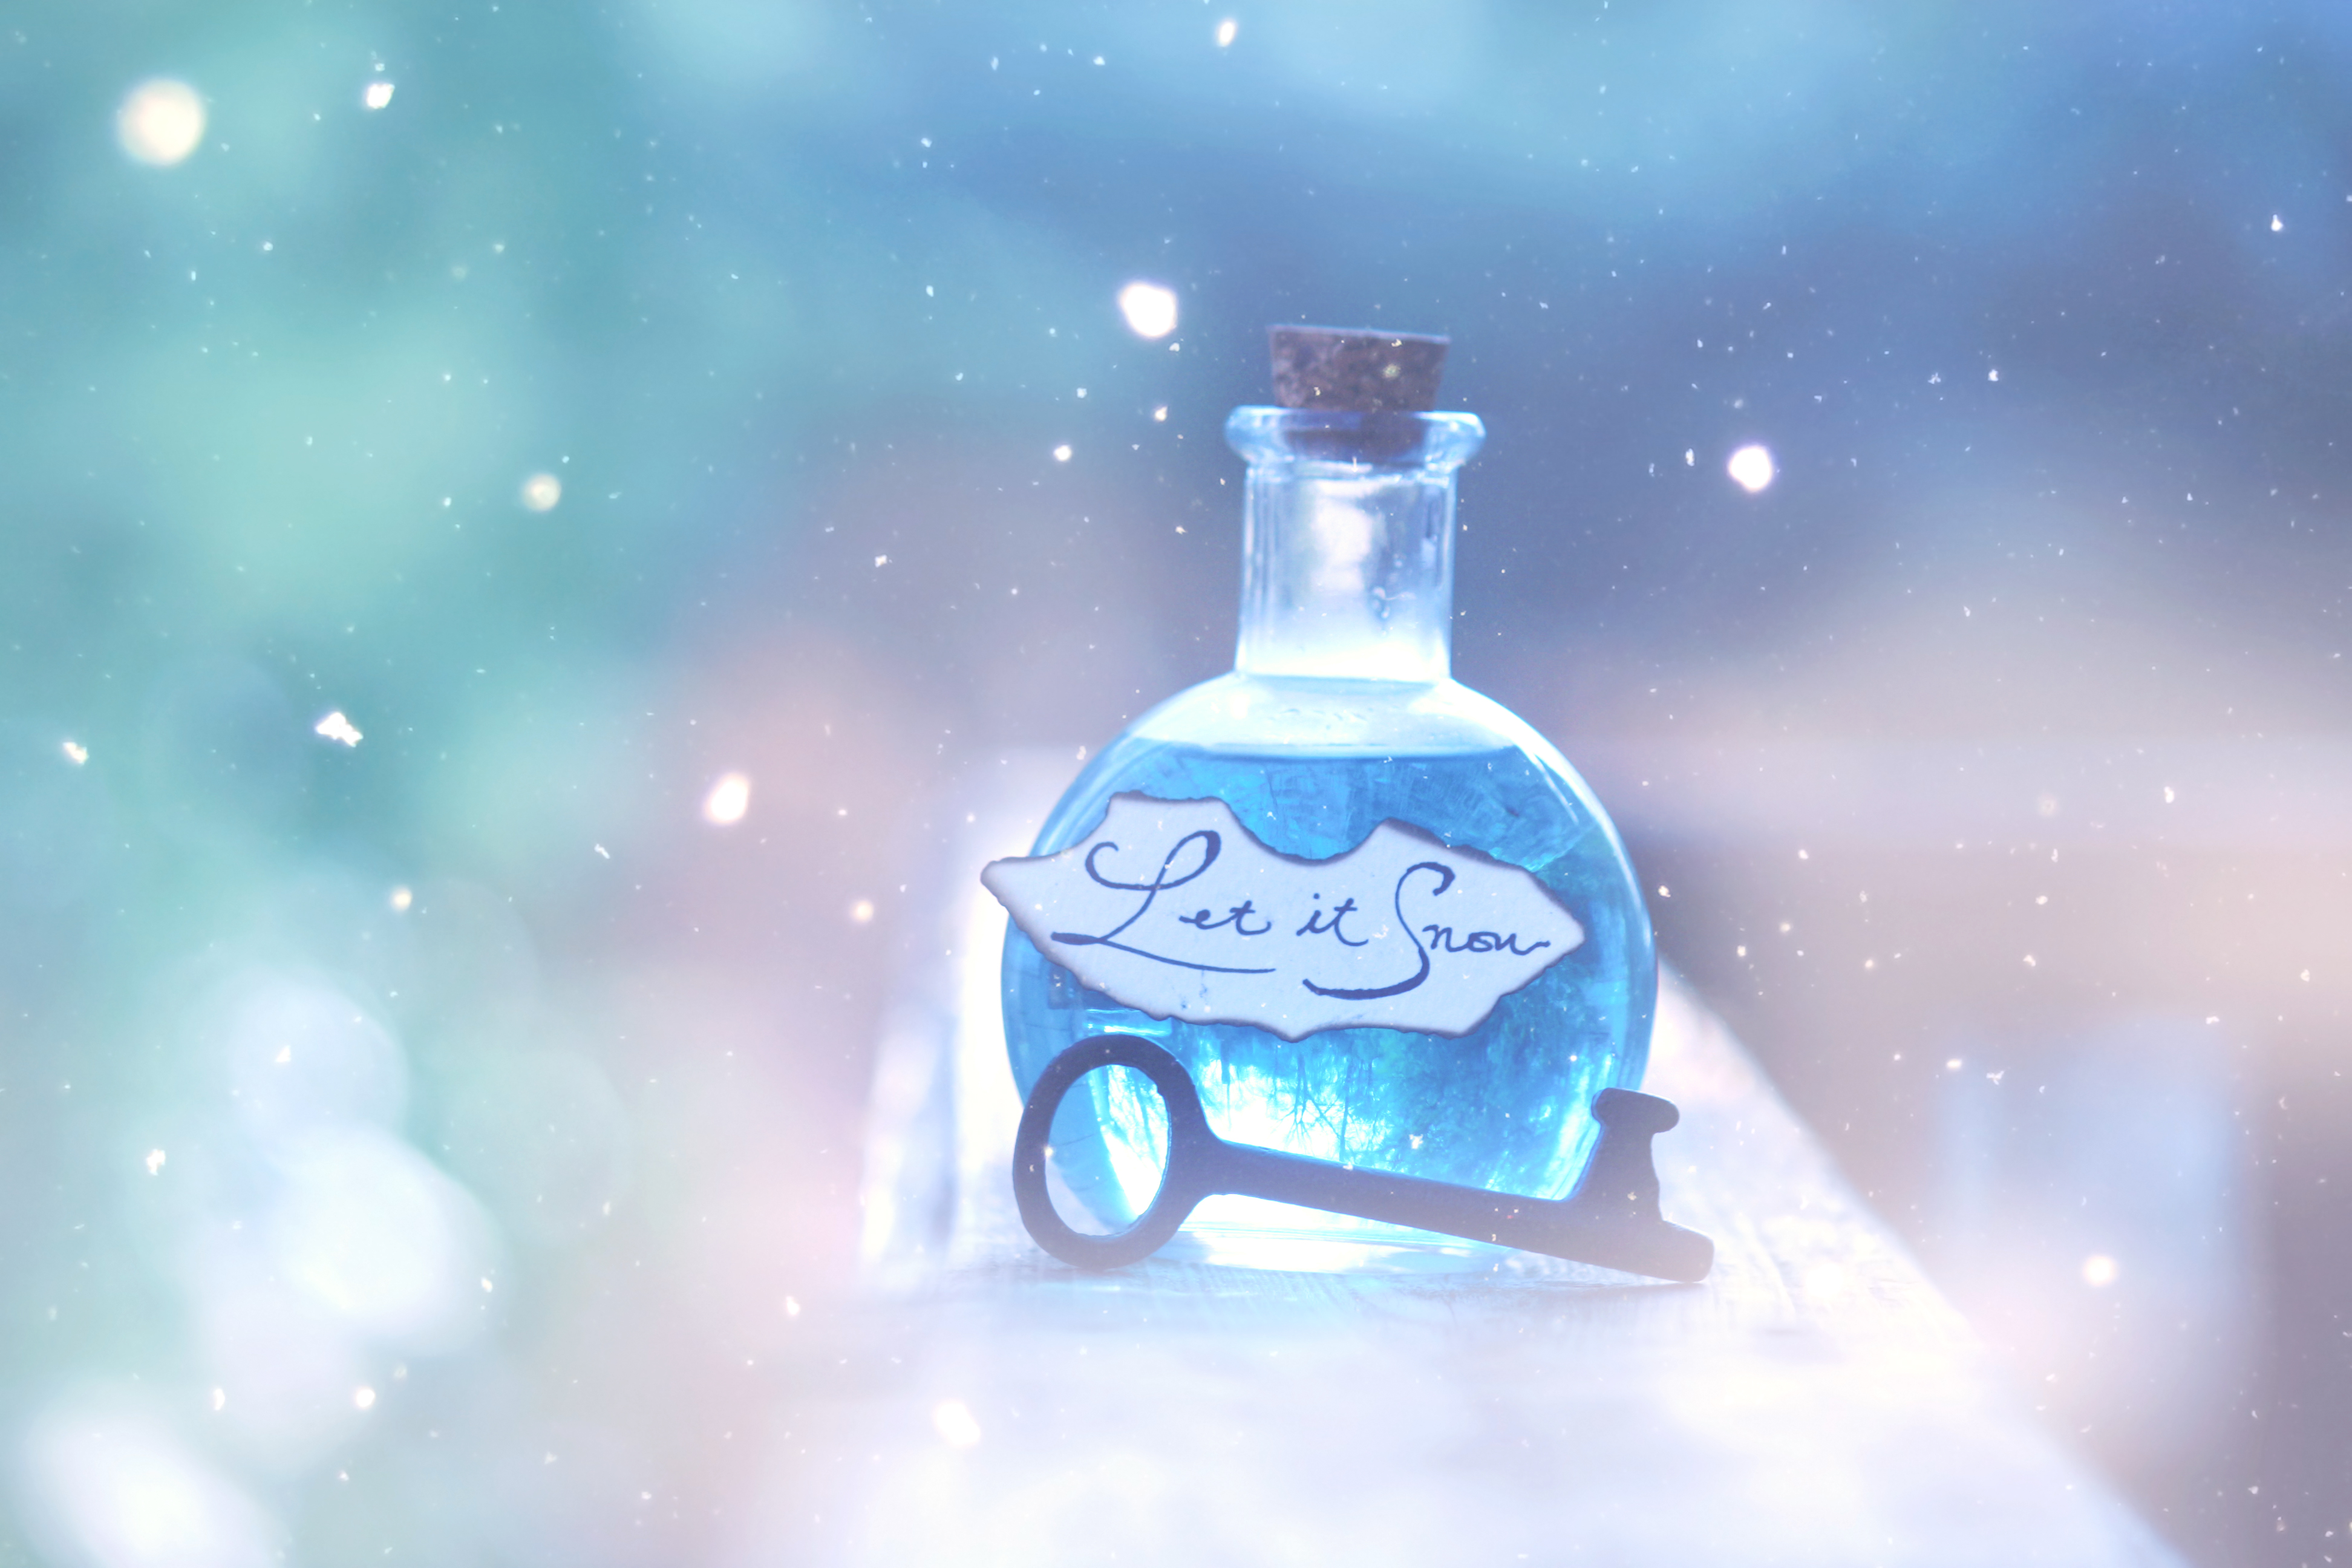 Snow Love Wallpaper For Mobile : Let It Snow Wallpaper - HD Wallpapers - 9to5Wallpapers